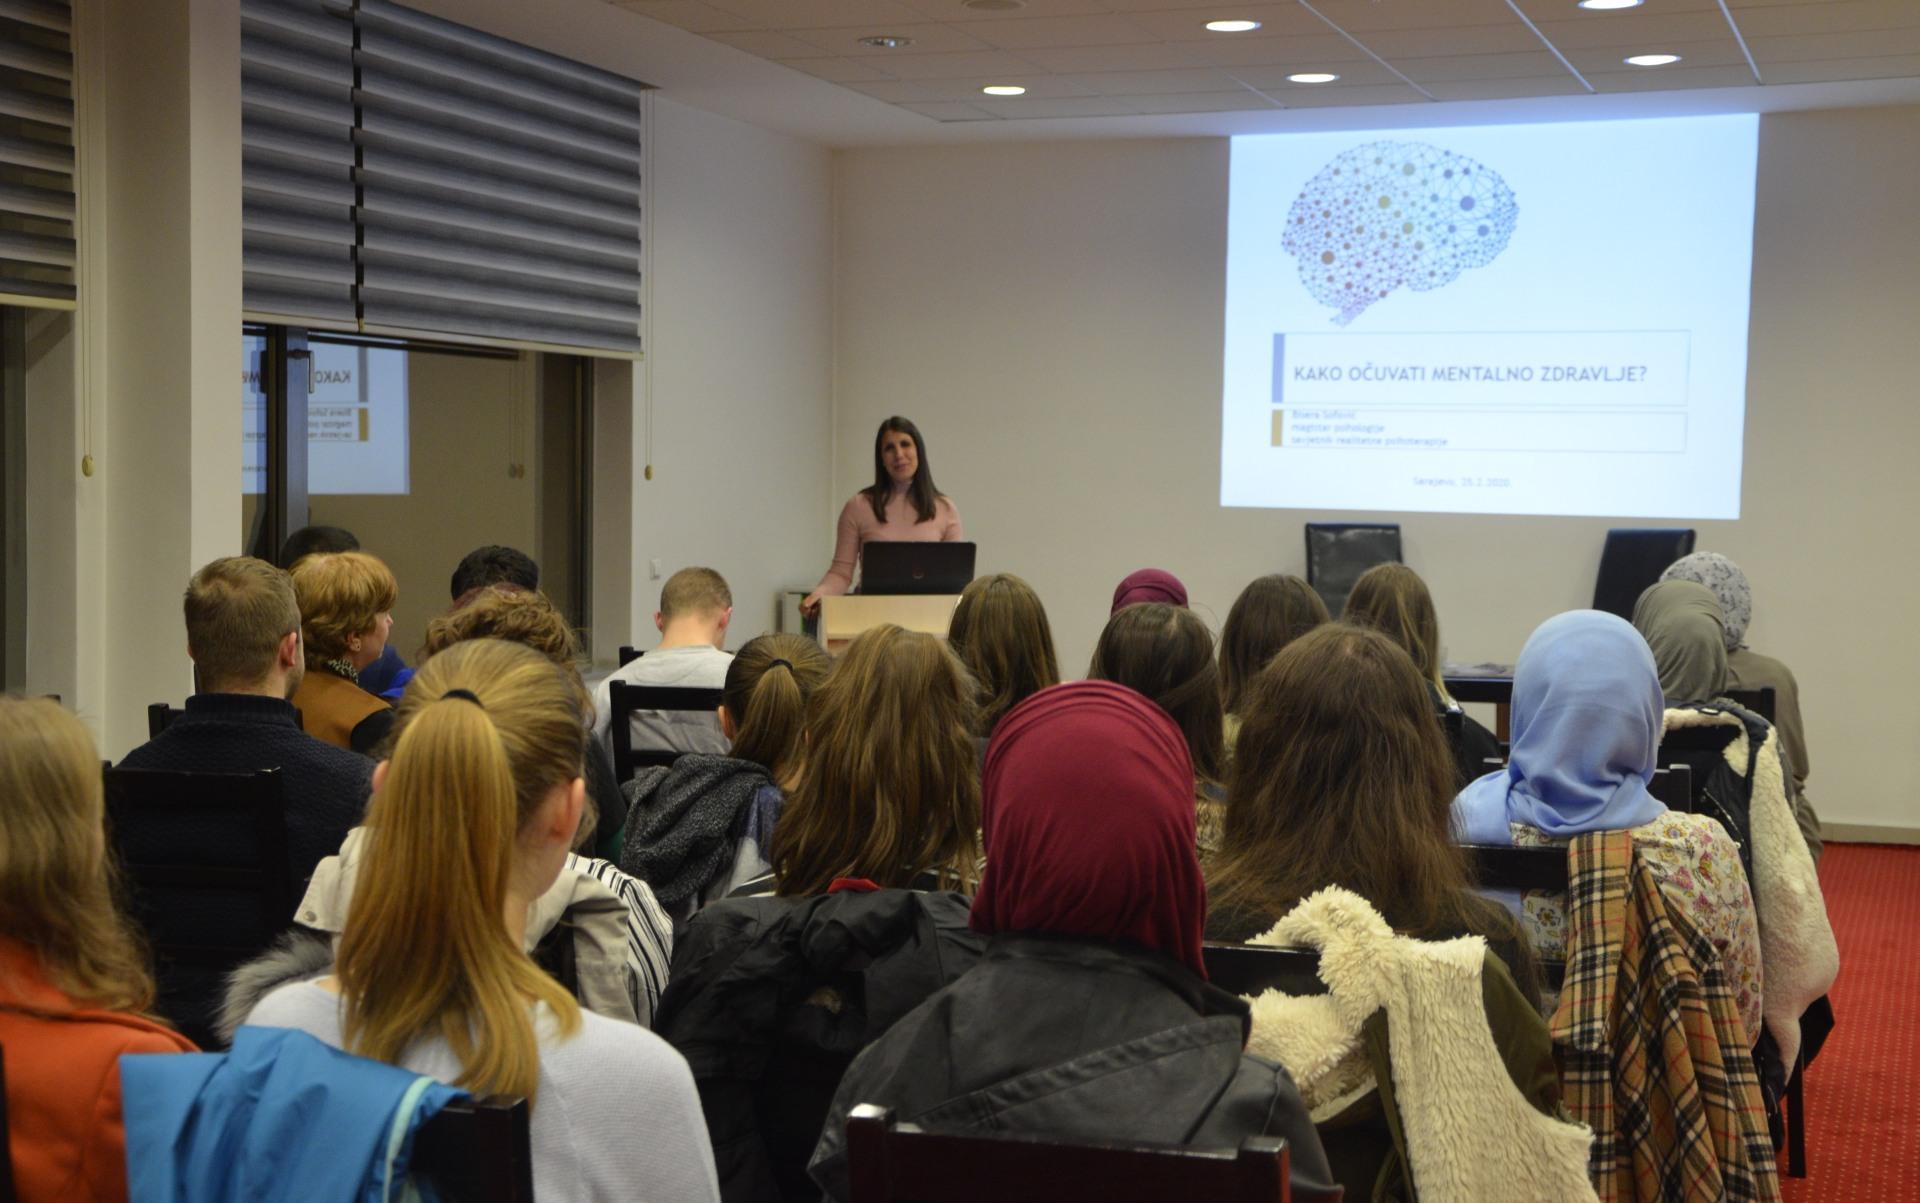 Kako ocuvati mentalno zdravlje - predavanje Bisere Sofovic 25.2.2020.